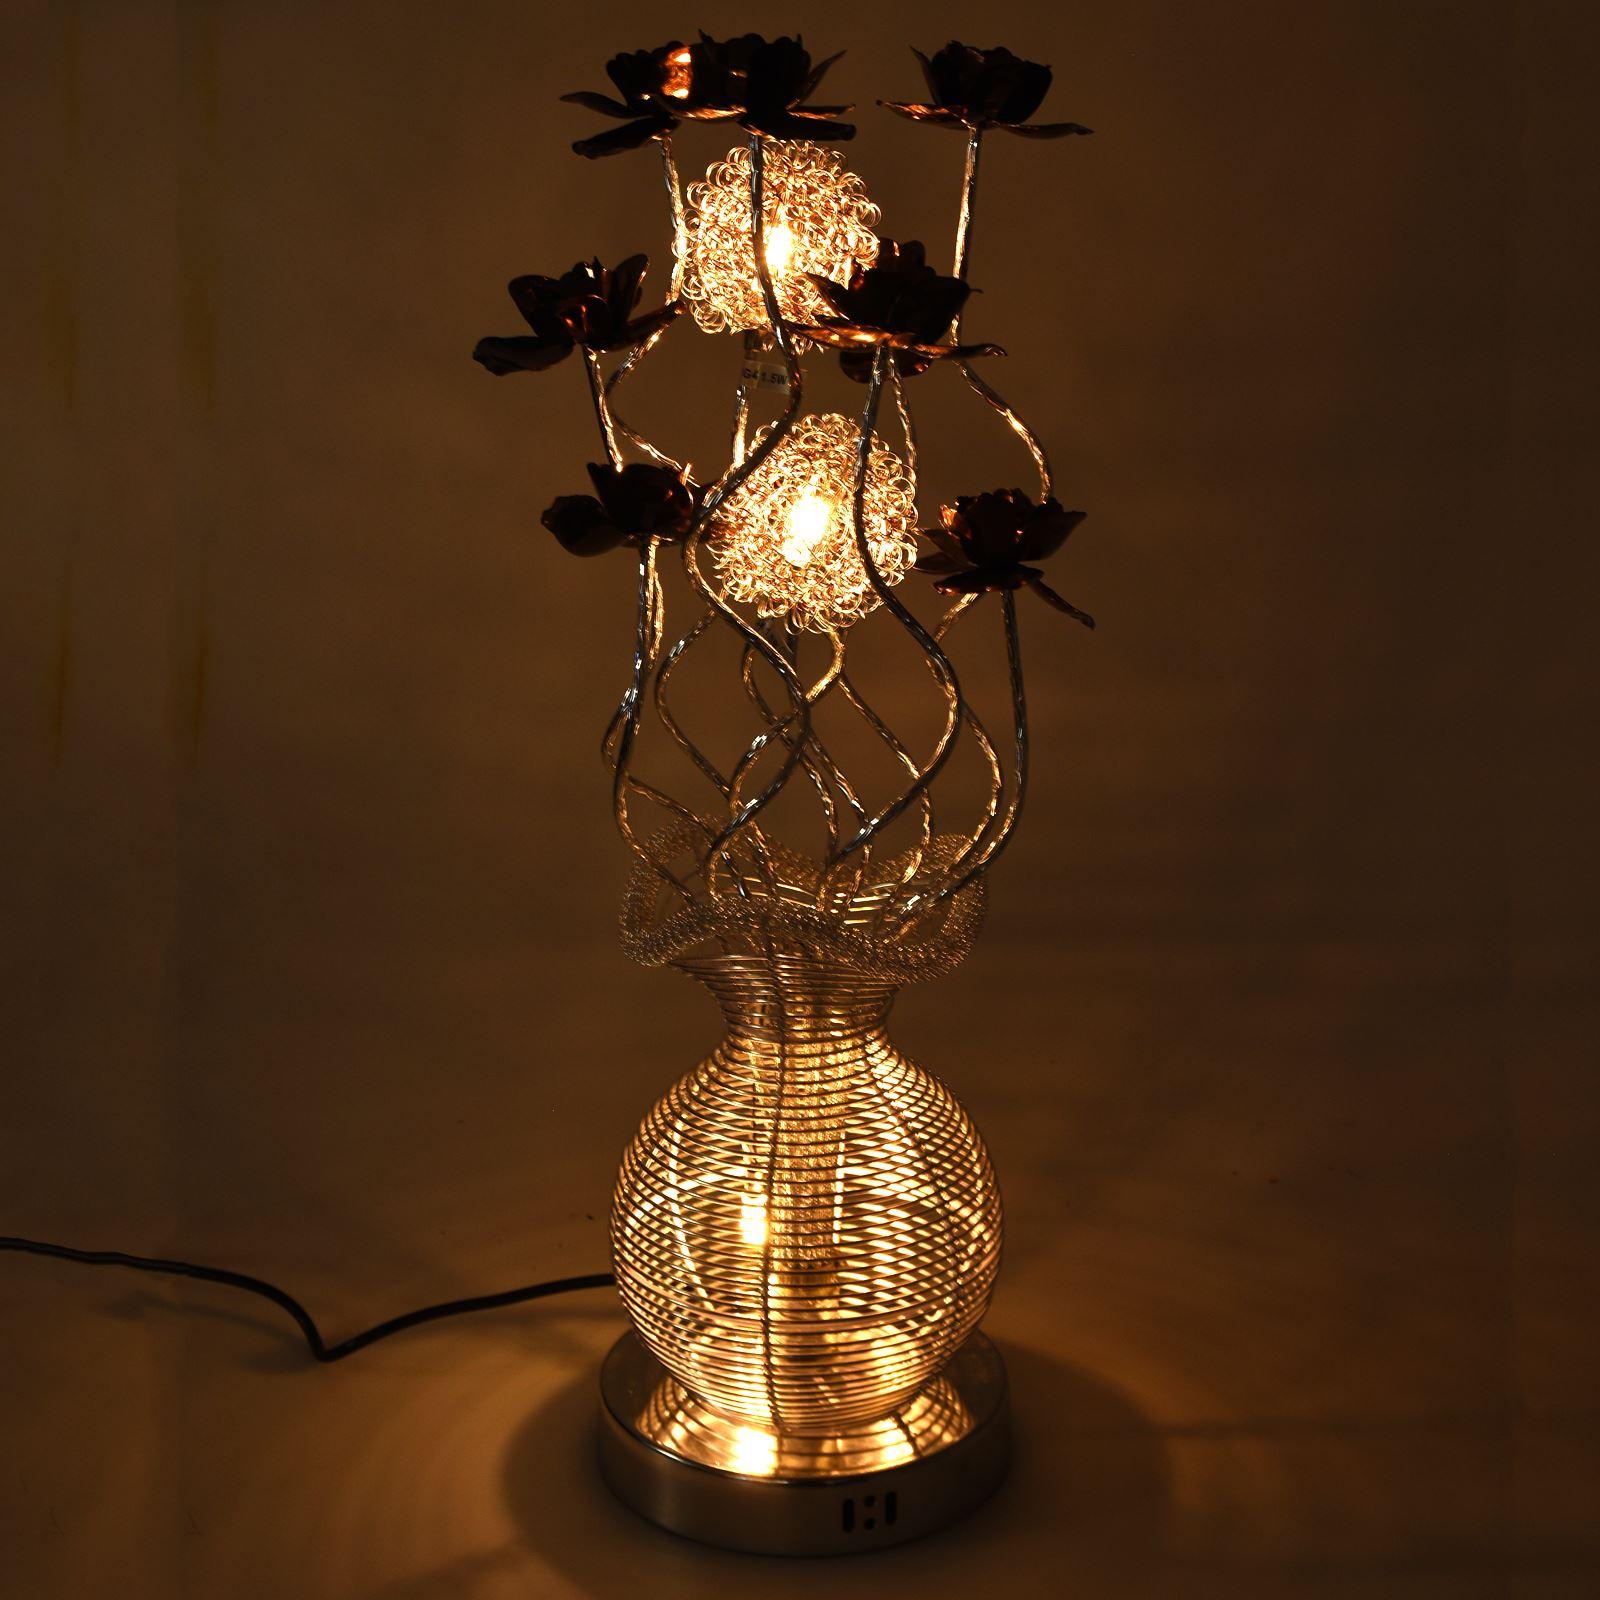 Large Base Light Bulb